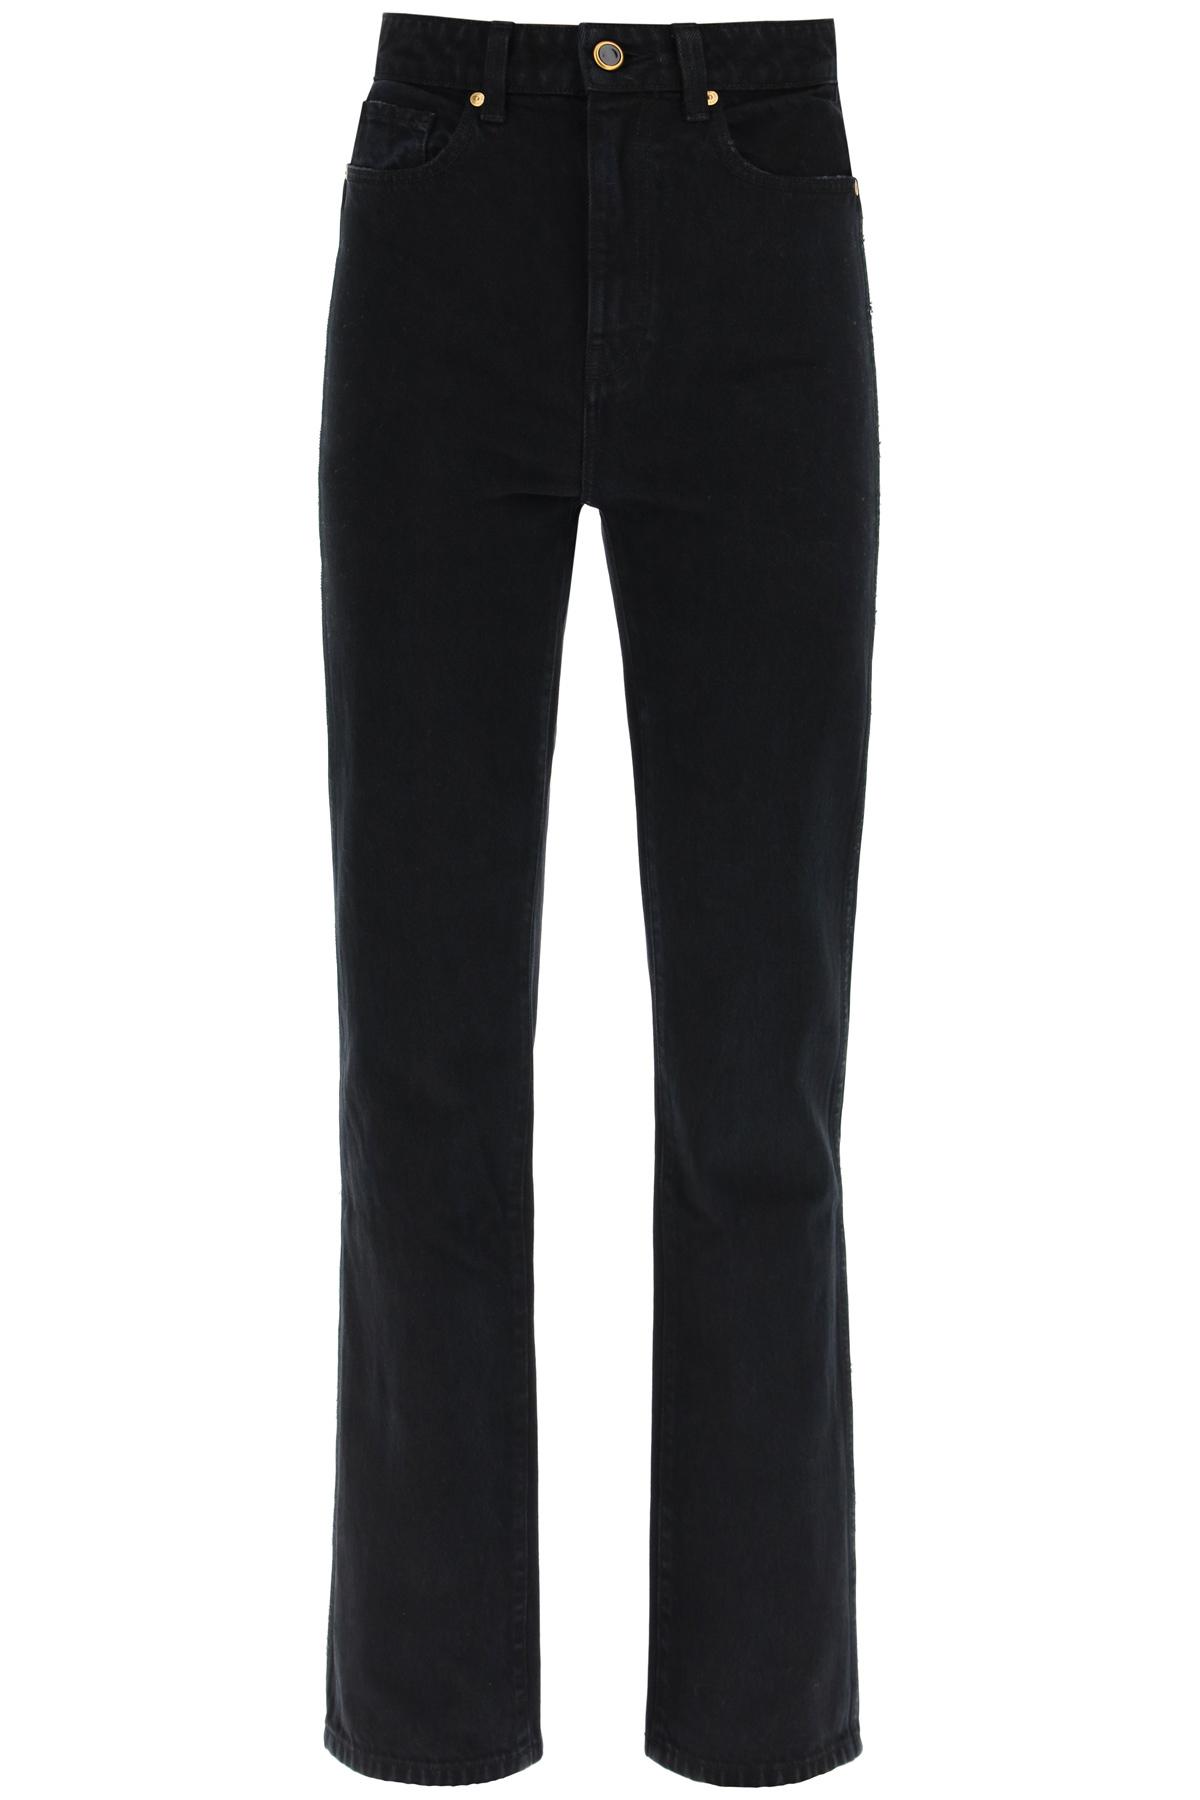 Khaite jeans danielle